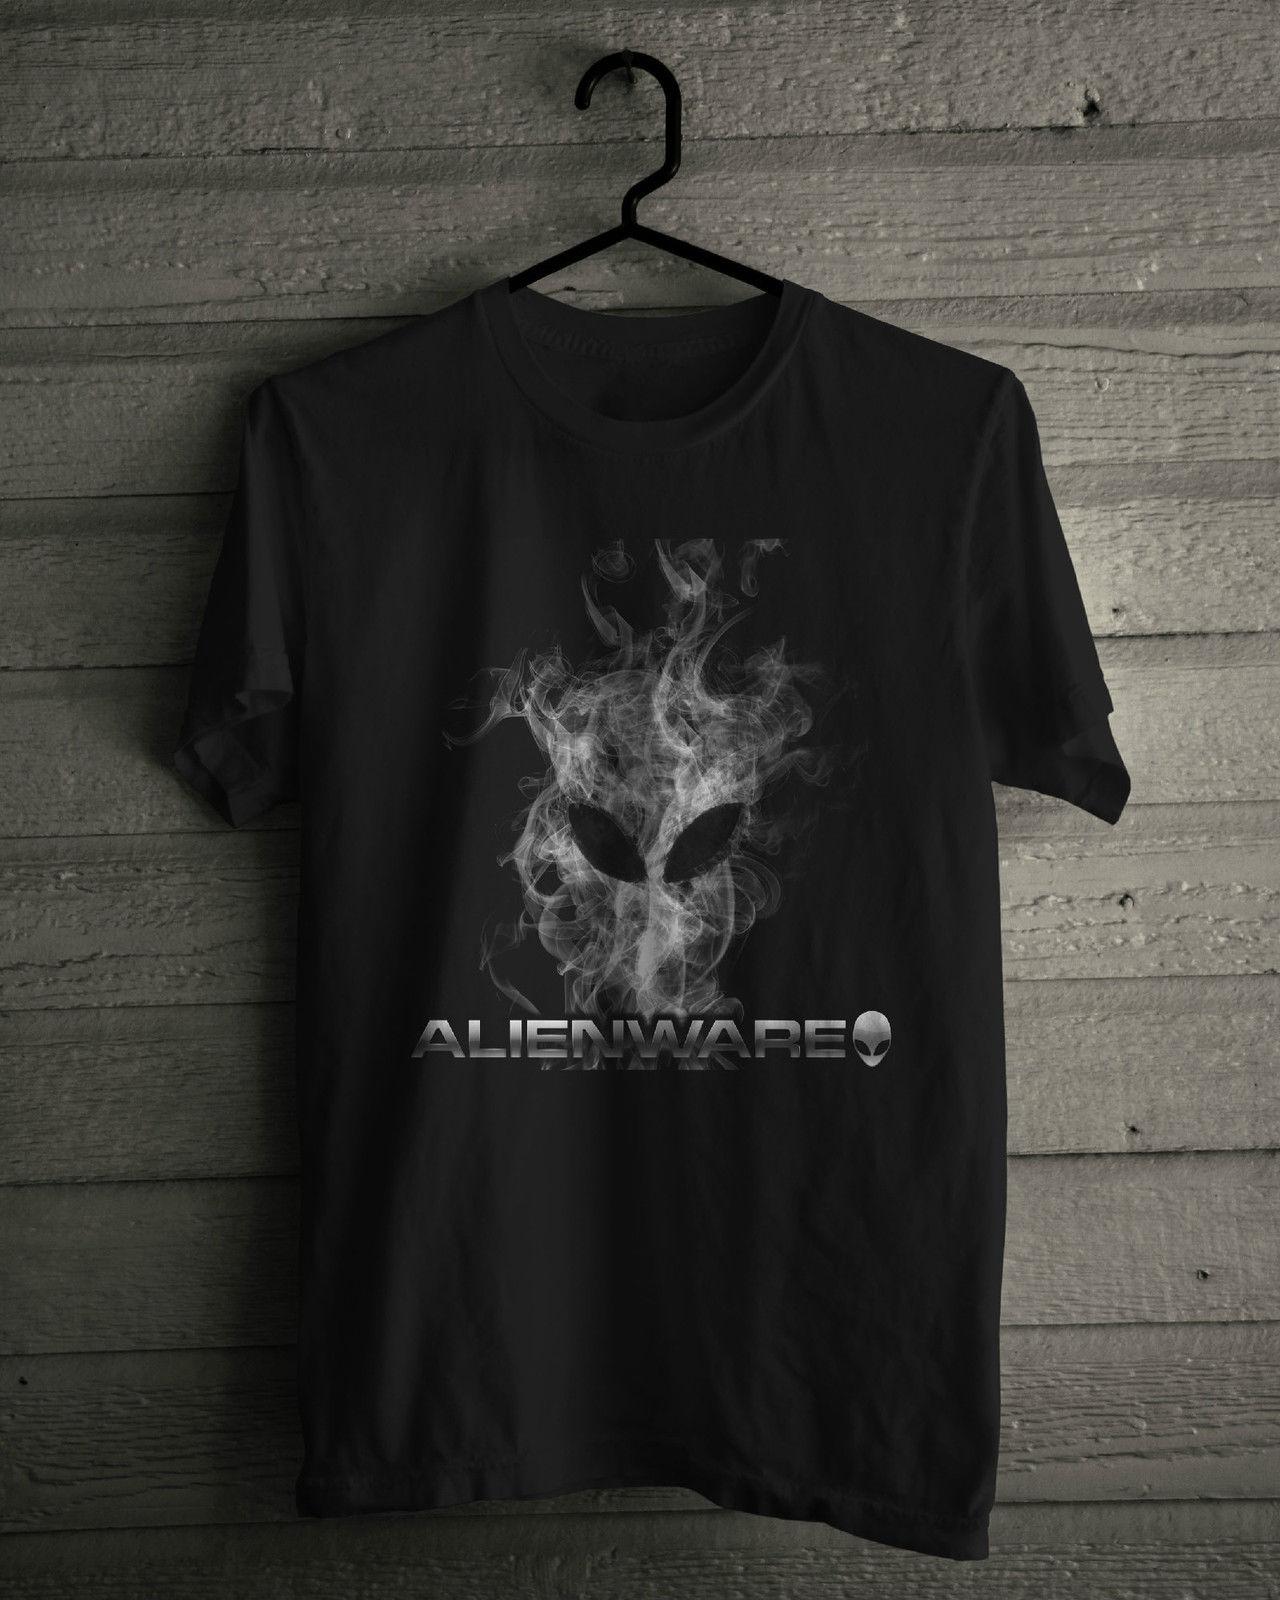 Alienware T-Shirt, Black Tee Shirts 2019 New Fashion T shirt Brand Hip Hop Print Men Tee Shirt High Quality 100% Cotton